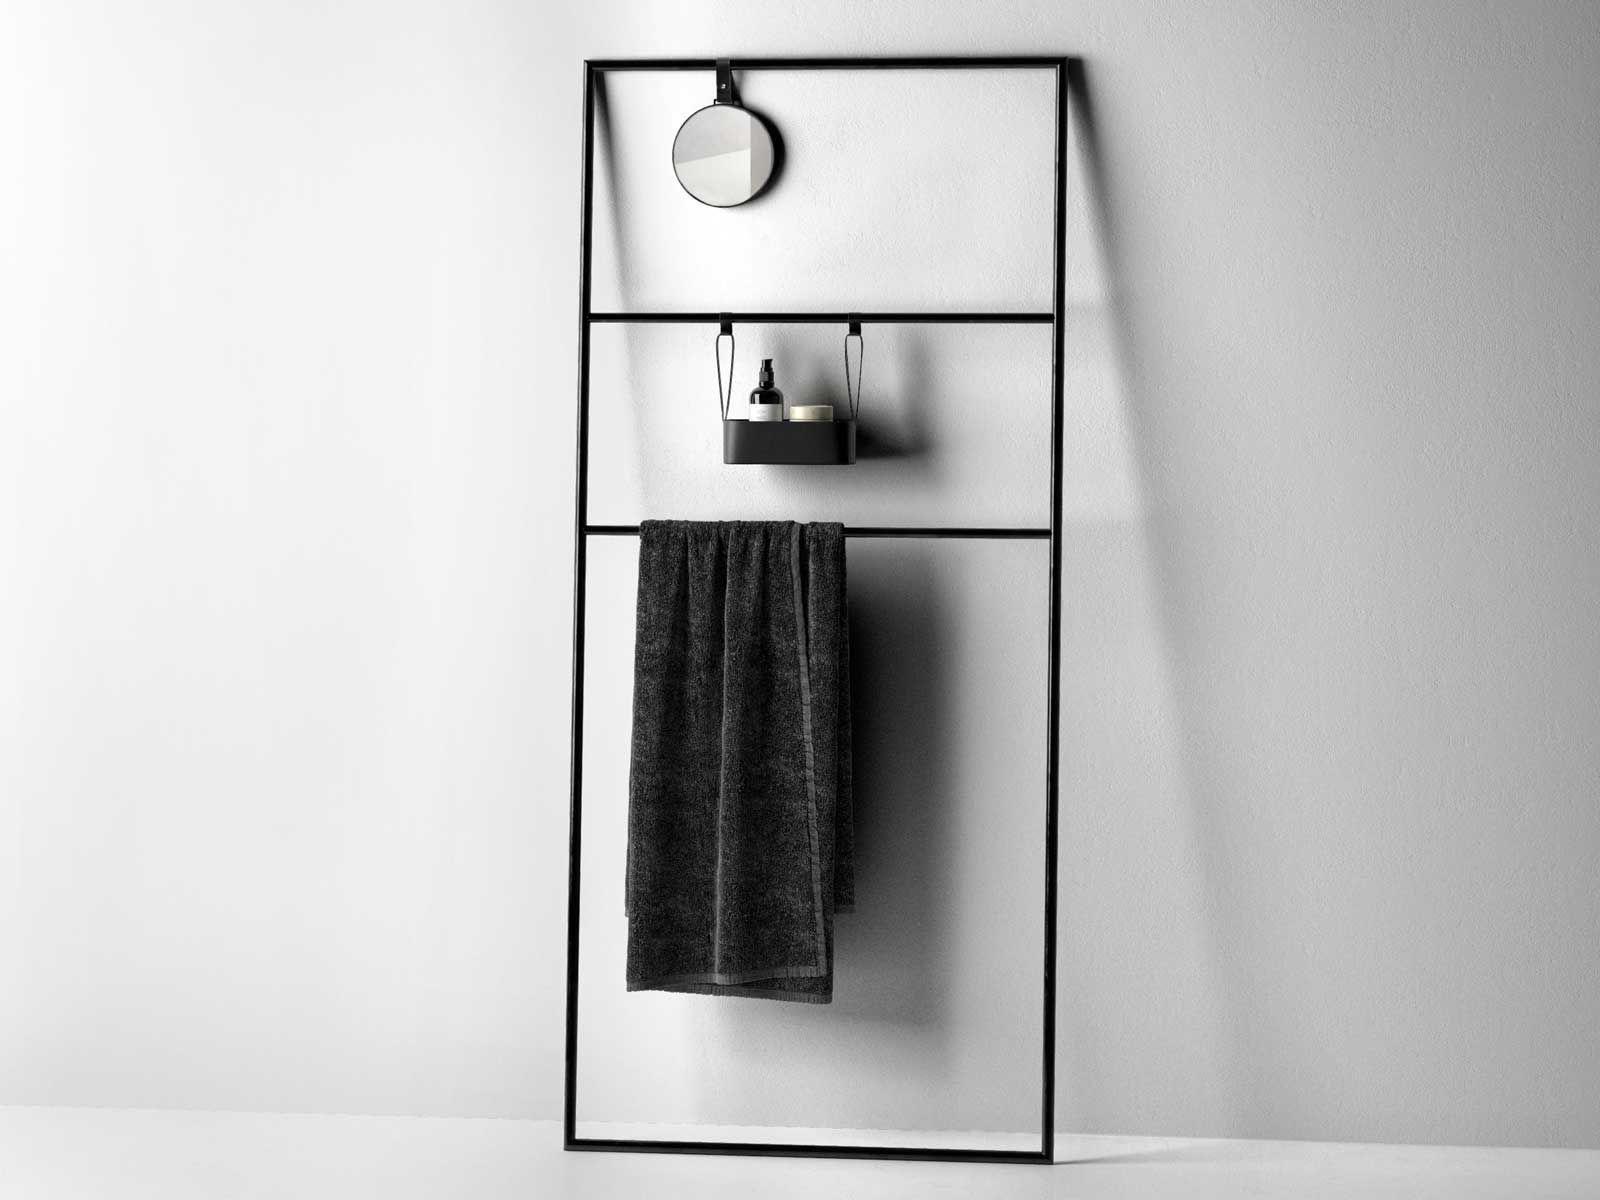 Coco Towel Rail Rack with Mirror and Bath Accessories | Bathroom ...